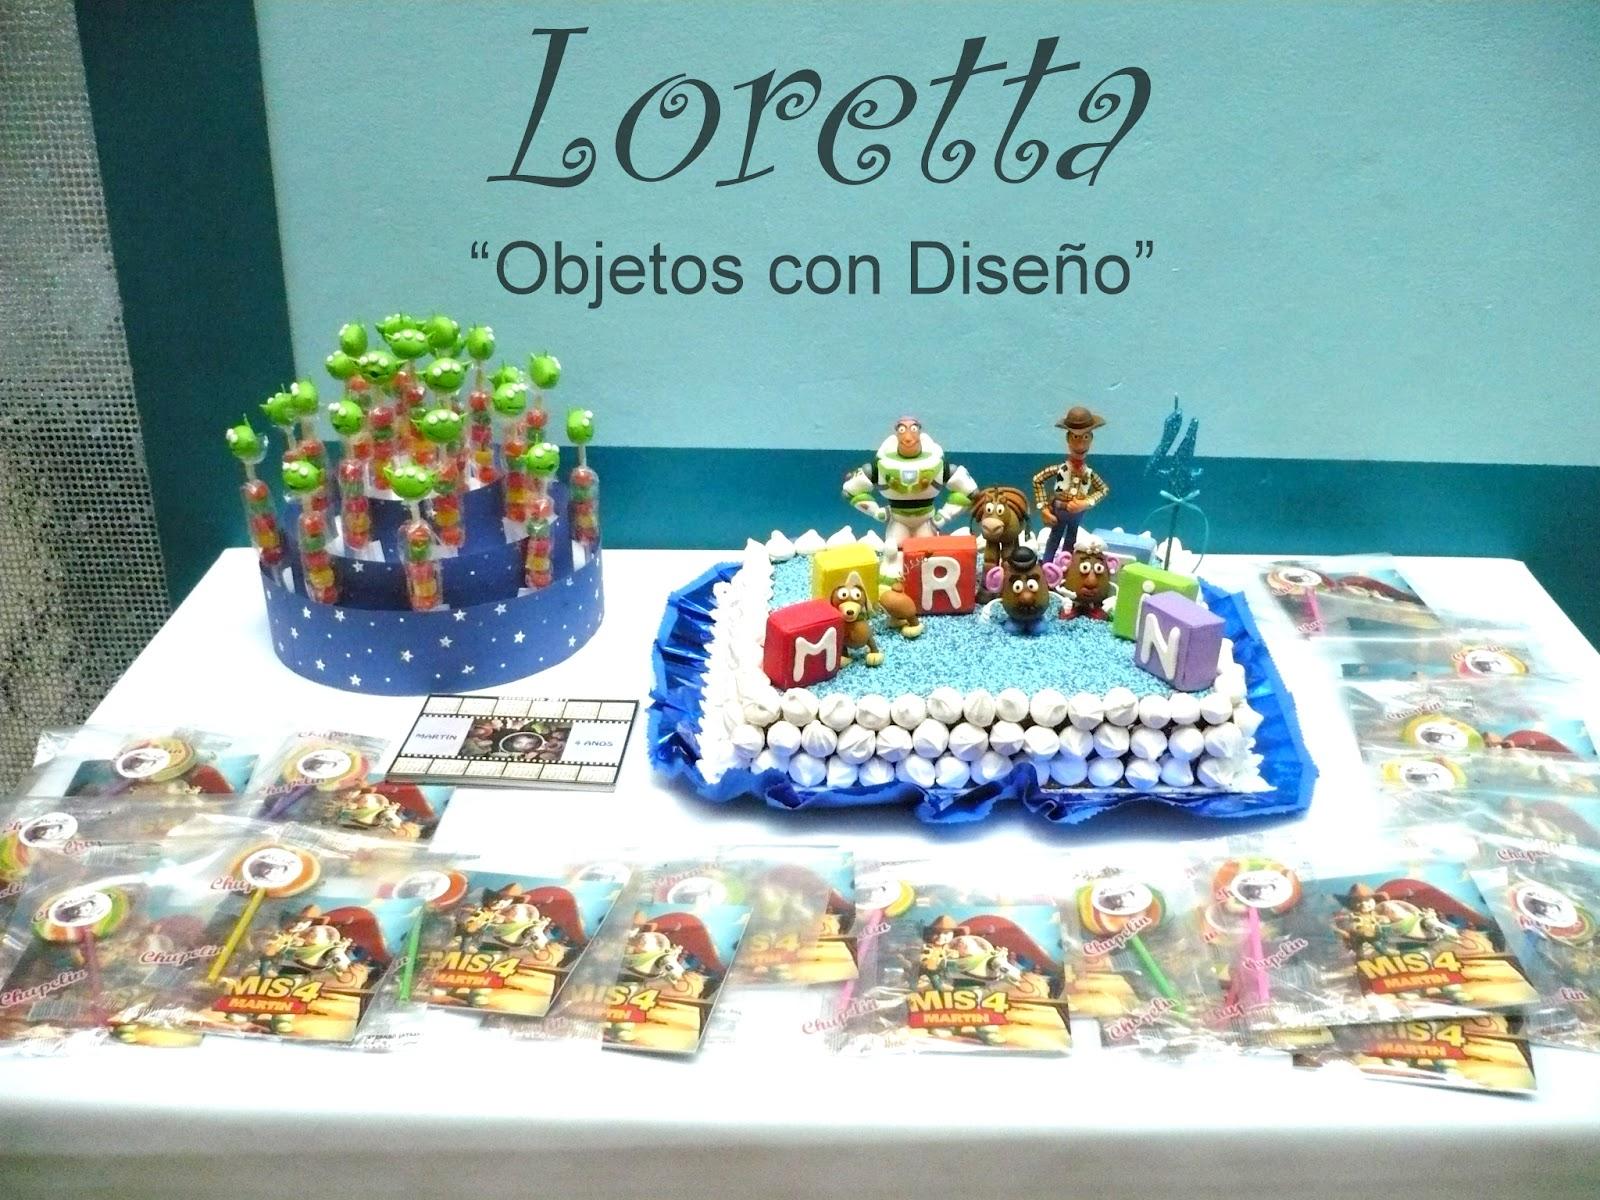 Loretta objetos con dise o decoraci n tem tica toy story - Objetos decoracion diseno ...